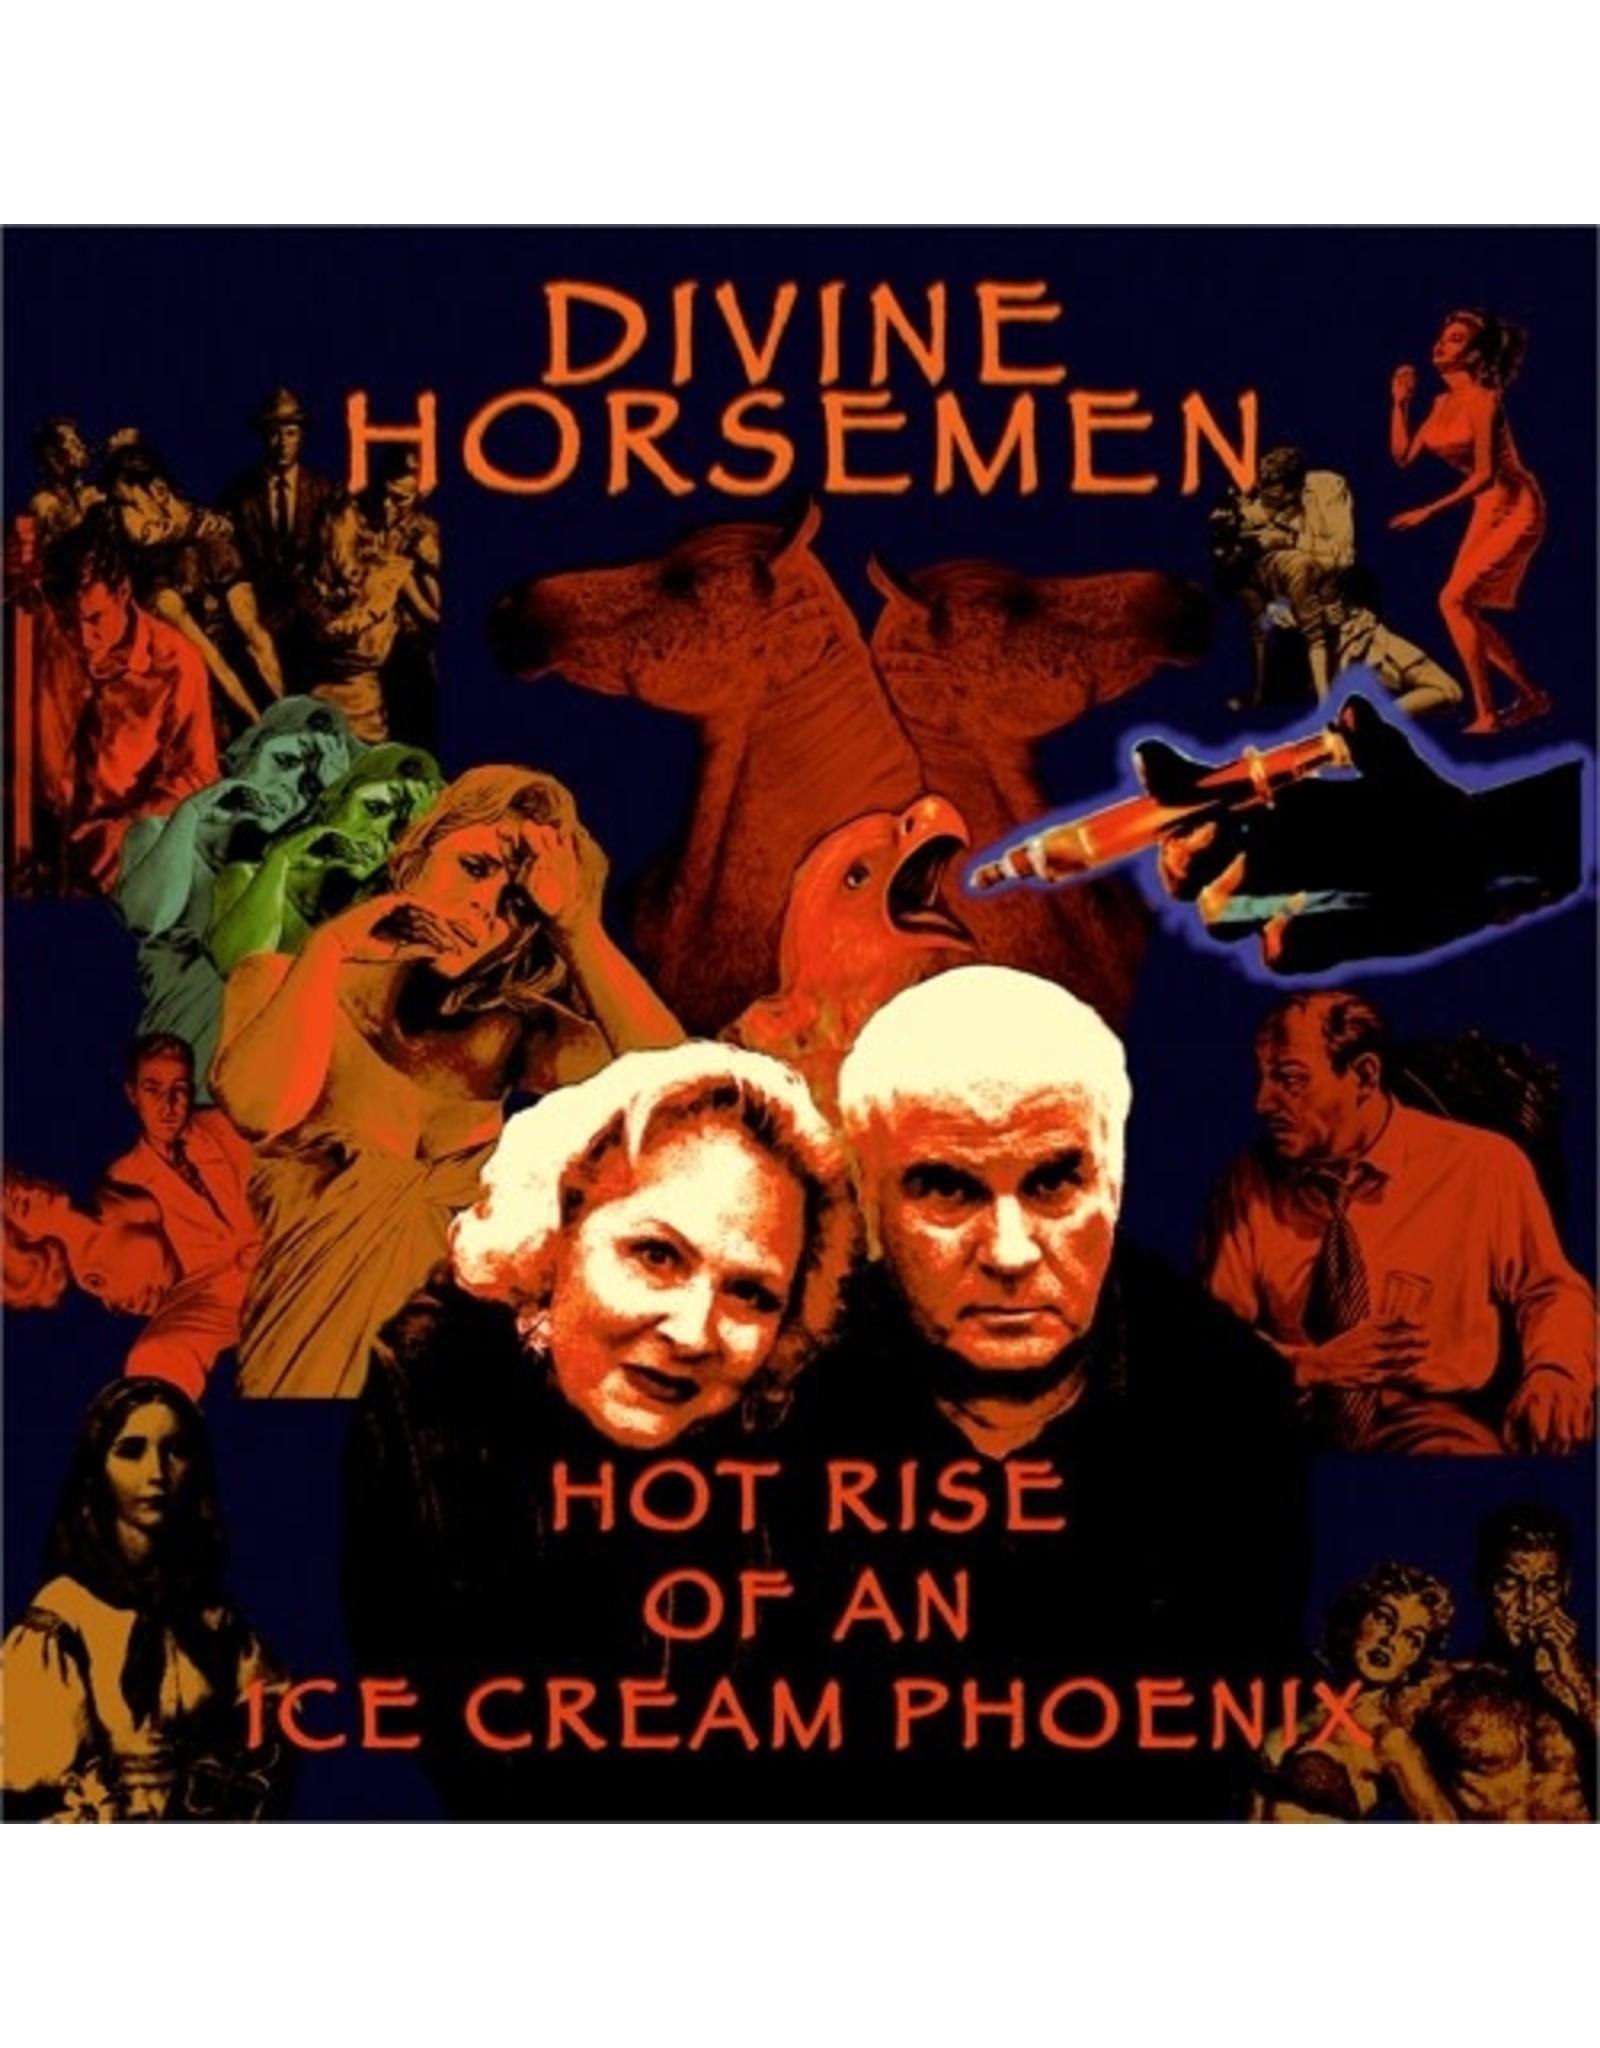 New Vinyl Divine Horsemen - Hot Rise Of An Ice Cream Phoenix 2LP